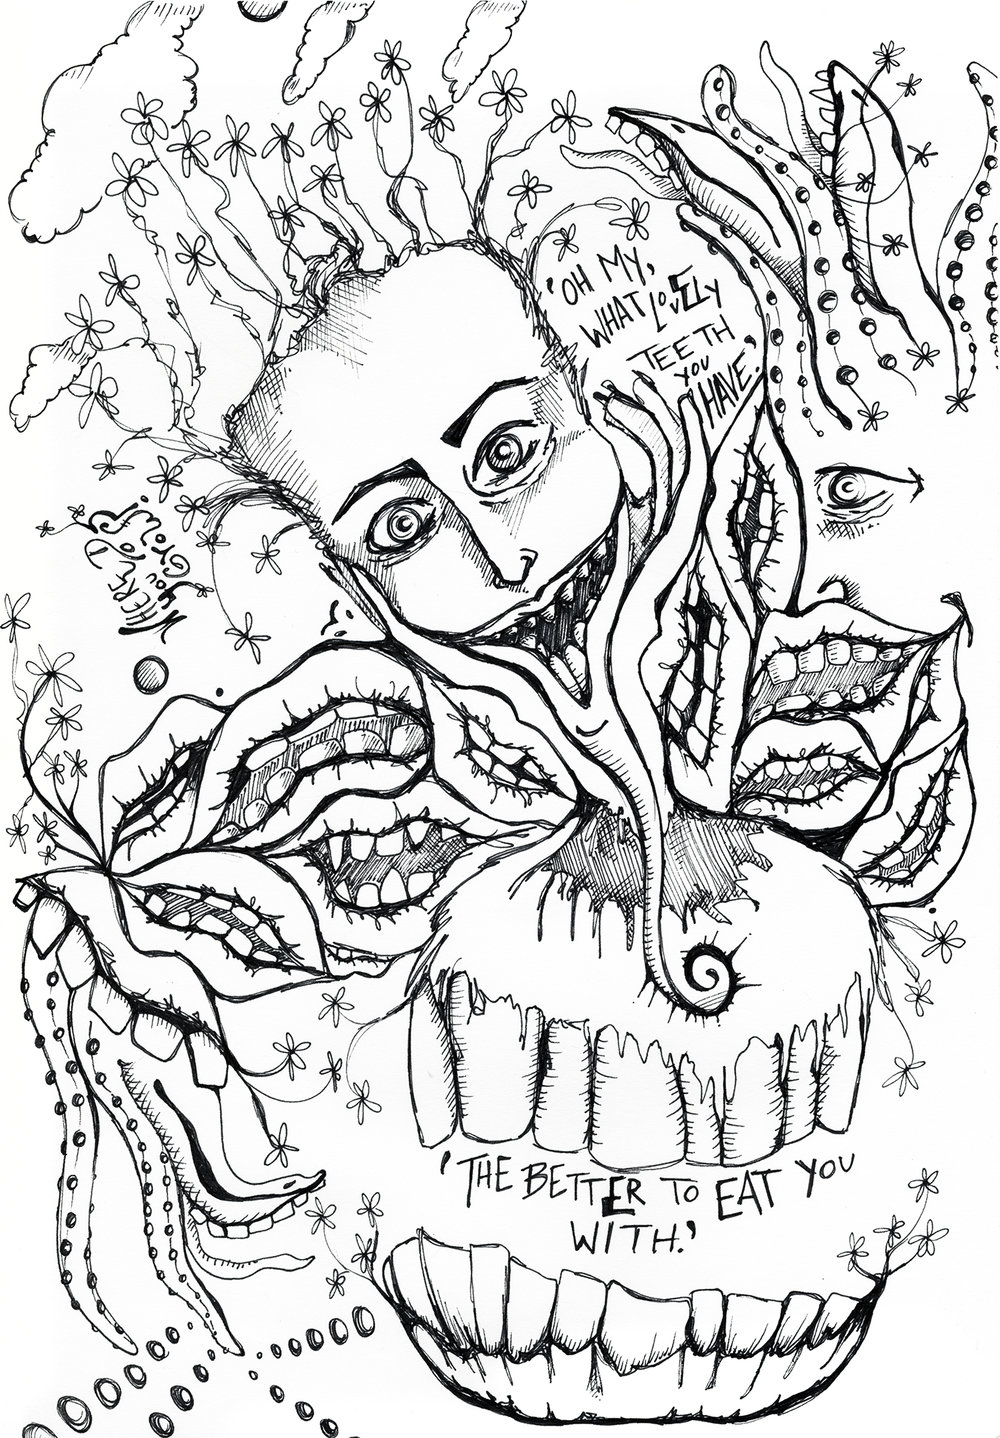 "Teeth  Pen, 9 x 12"" / Geena Matuson @geenamatuson"